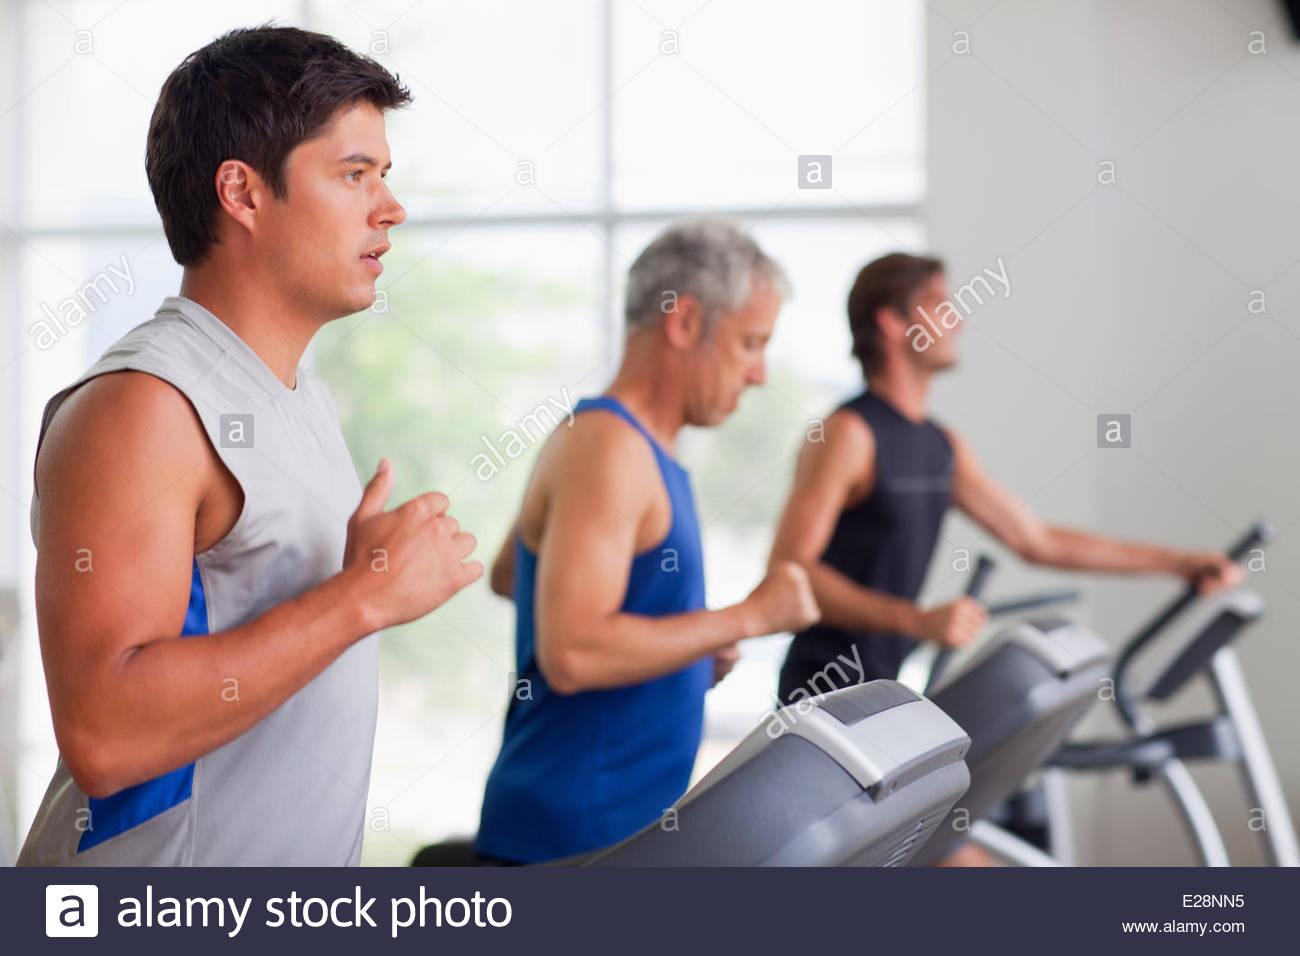 Men running on treadmills in gymnasium - Stock Image